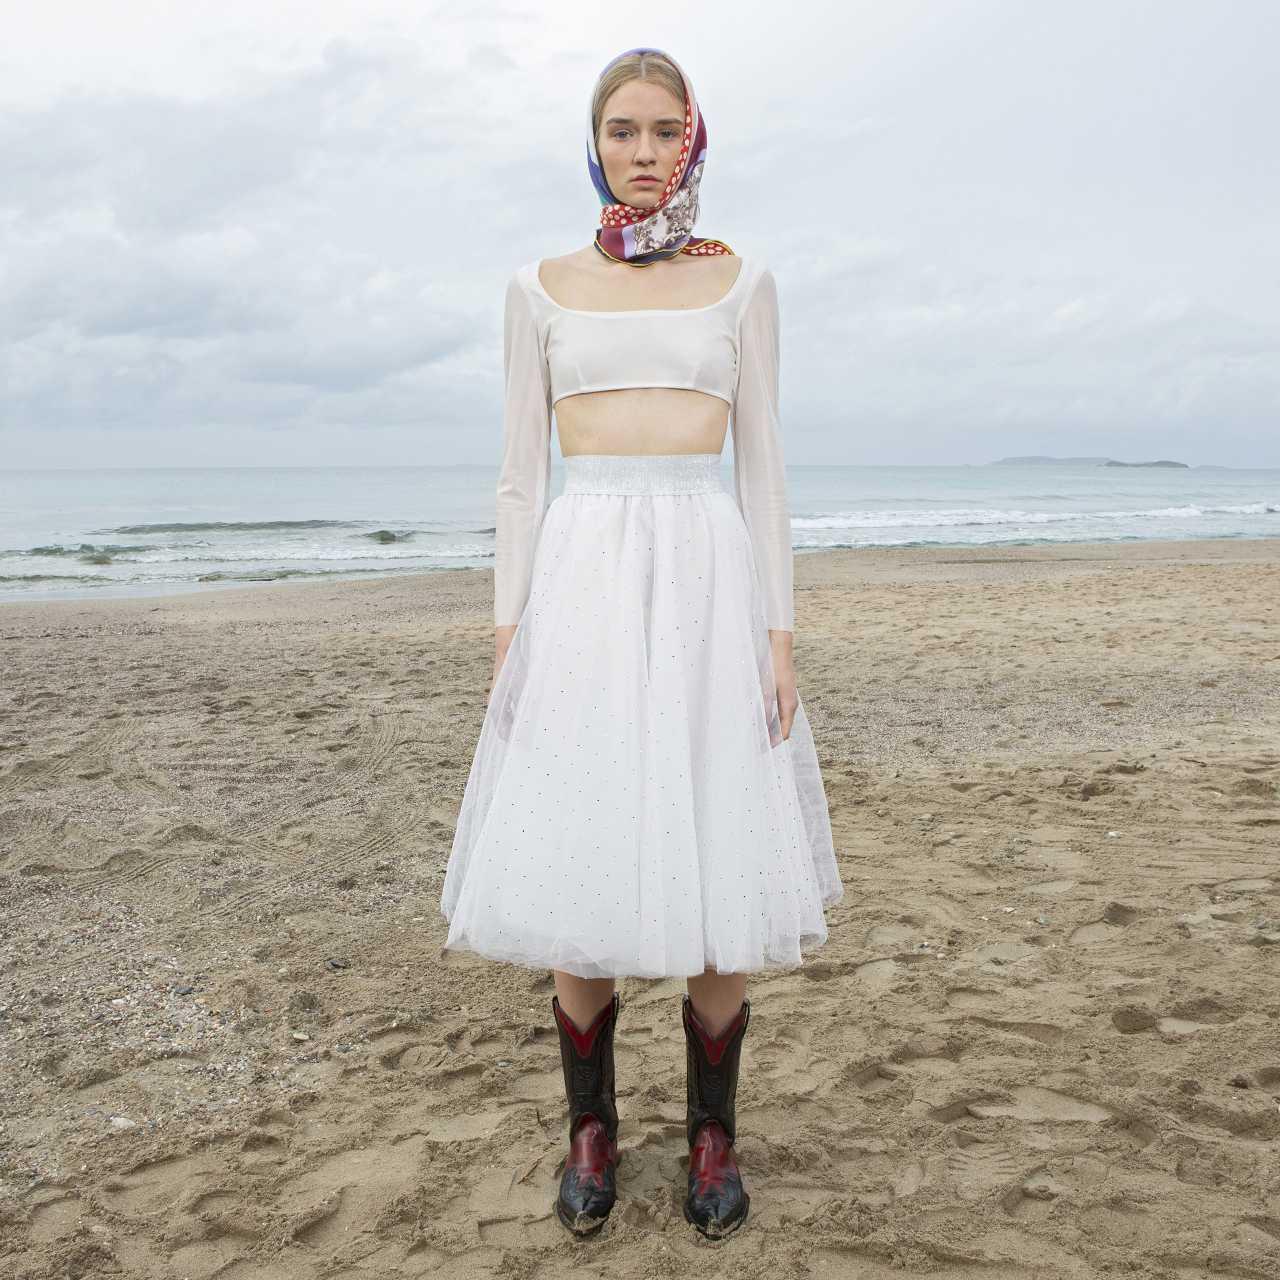 4decadf22a5 Η ultimate συλλογή Τούλινη Φούστα για Άνοιξη Καλοκαίρι 2019 από την ...